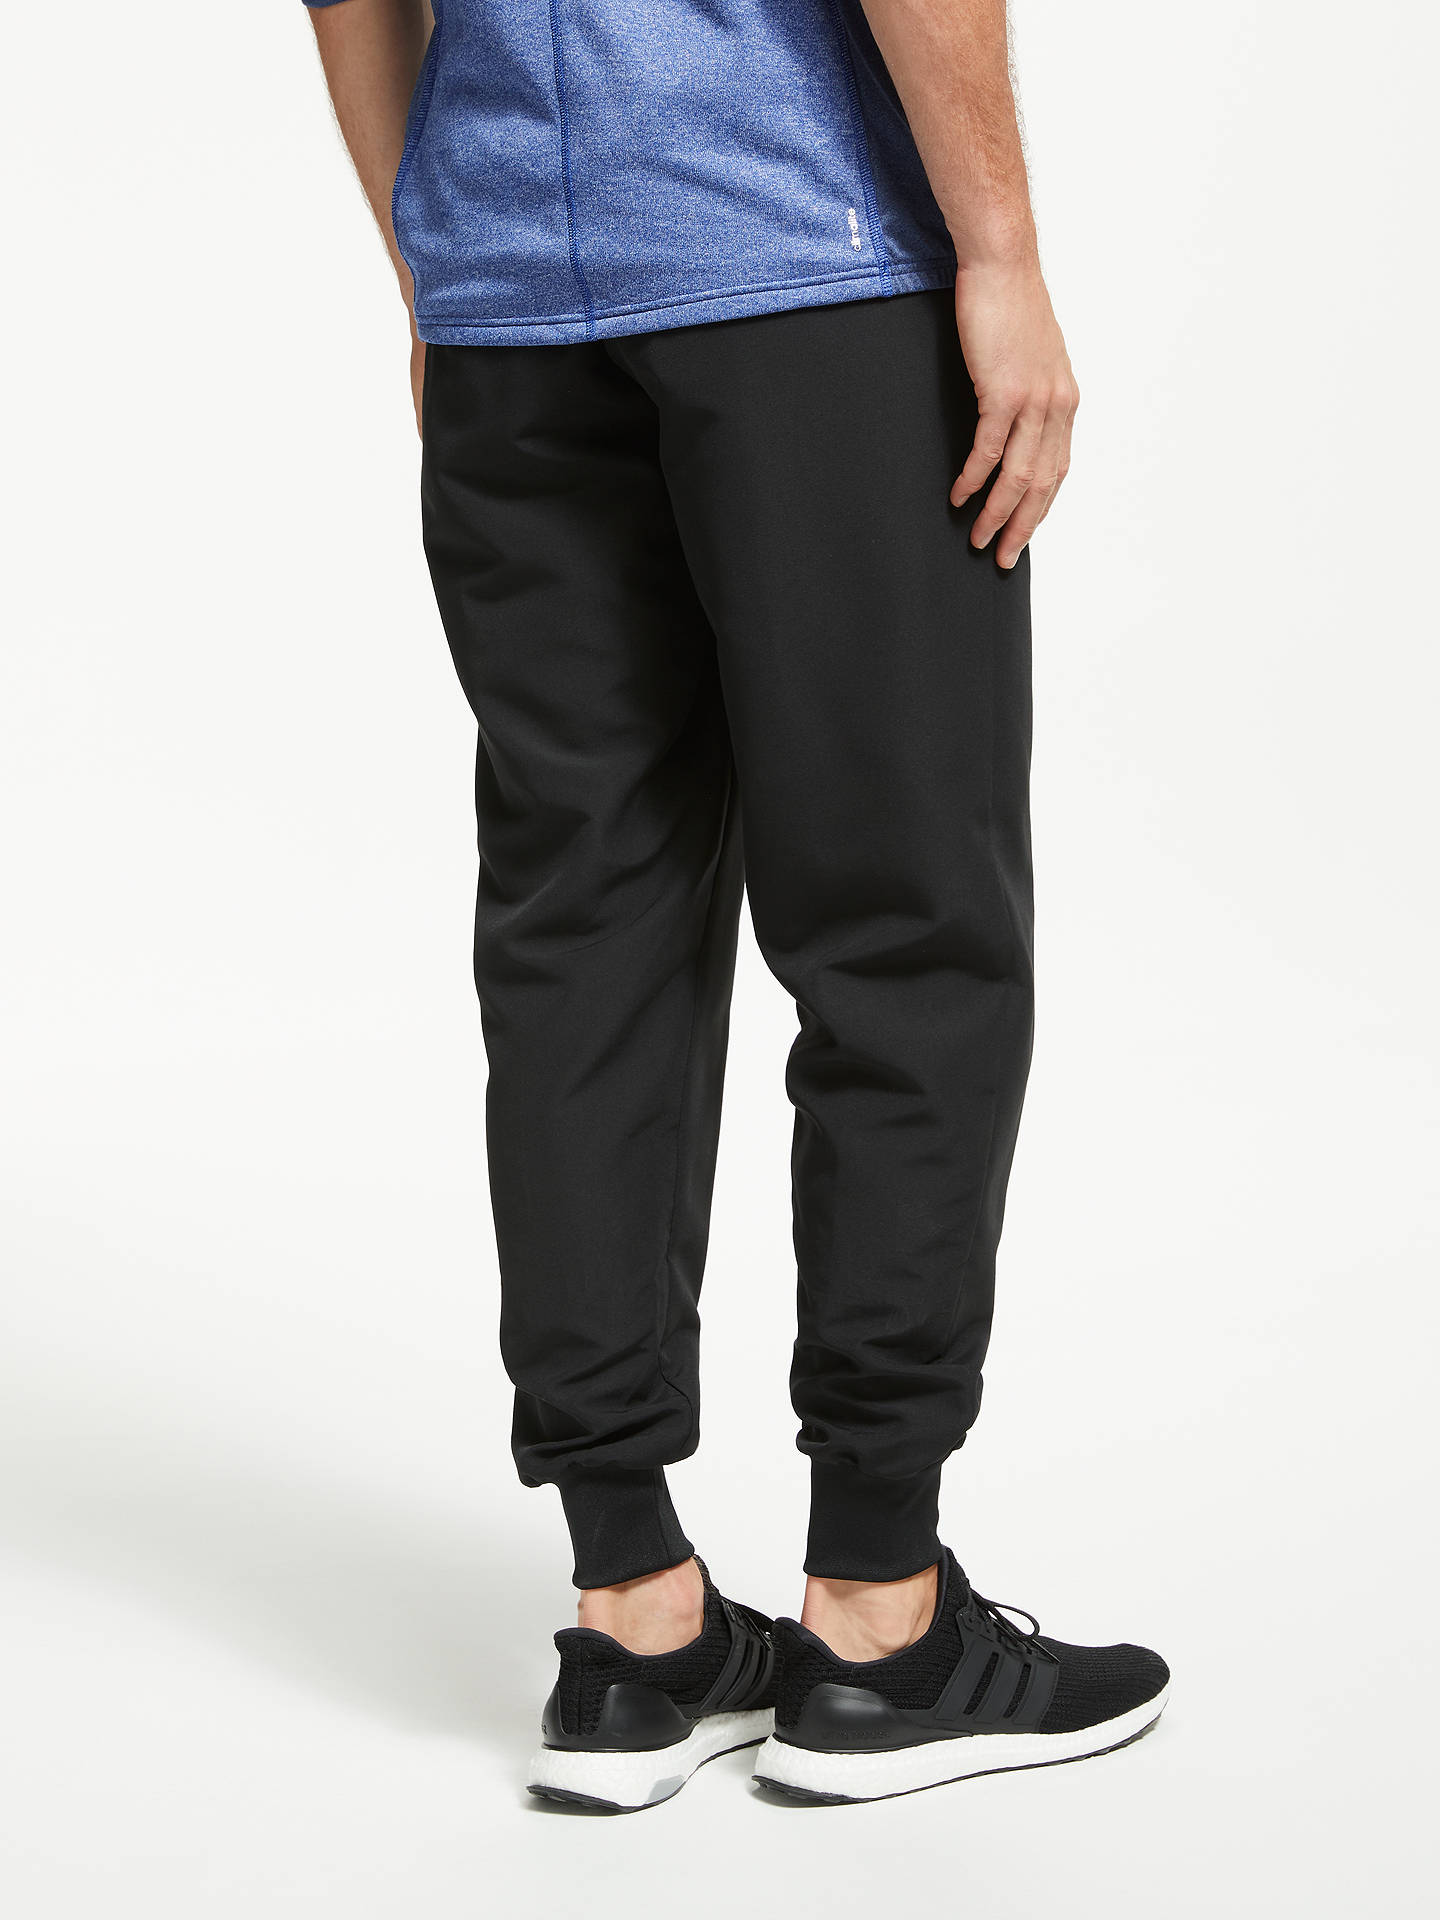 adidas Essentials Stanford 2 Cuffed Pants Black, Traininn